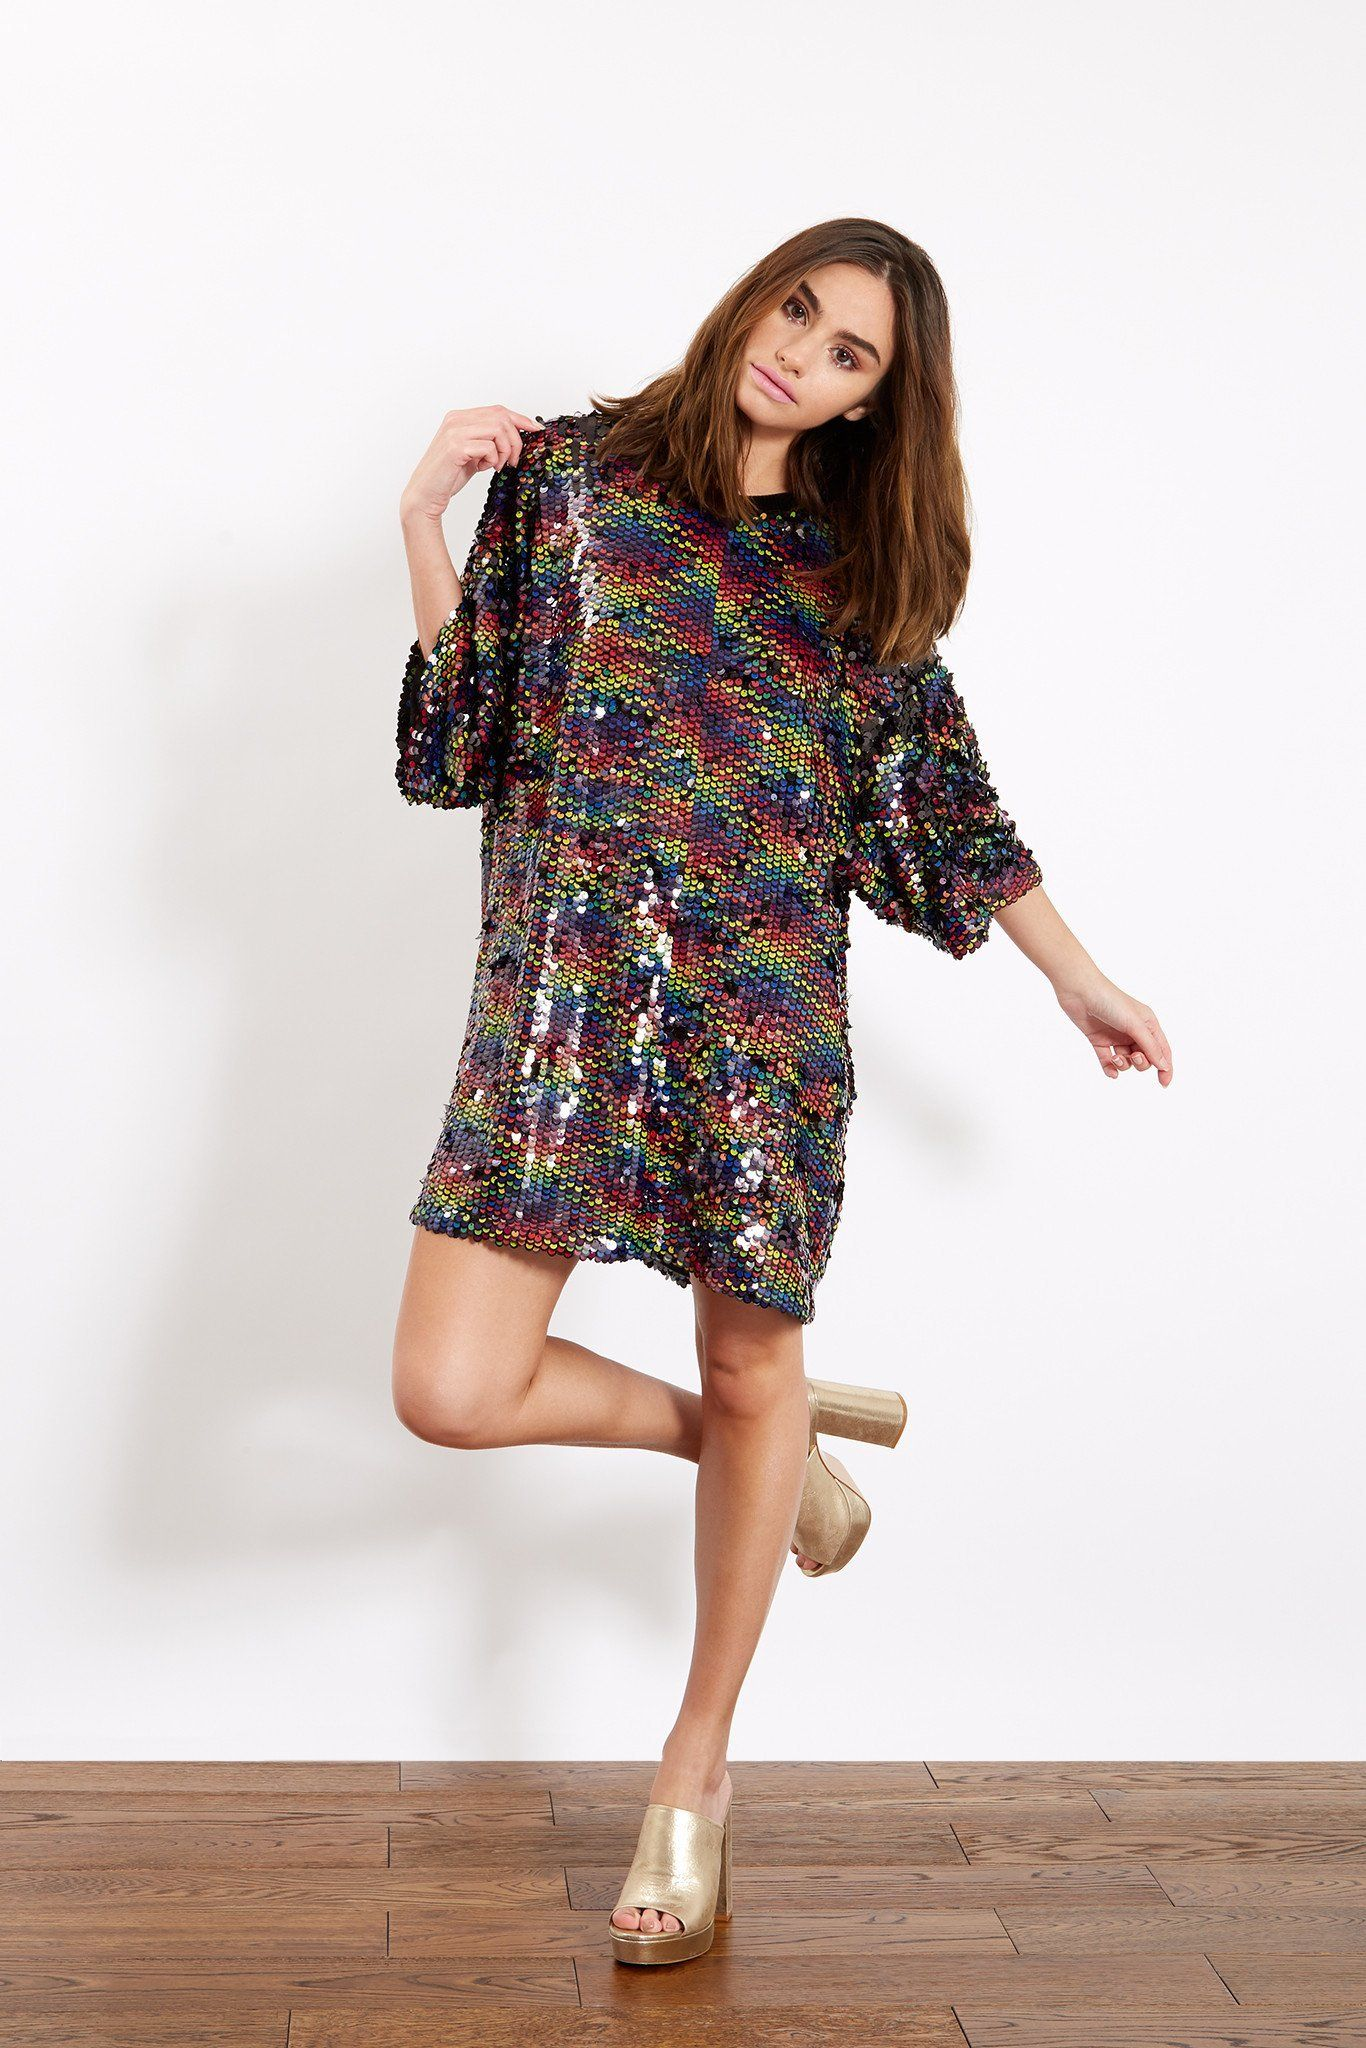 99dcdc77eae6 Rainbow Sequin Oversized T-Shirt Dress | Sequins | Oversized shirt ...